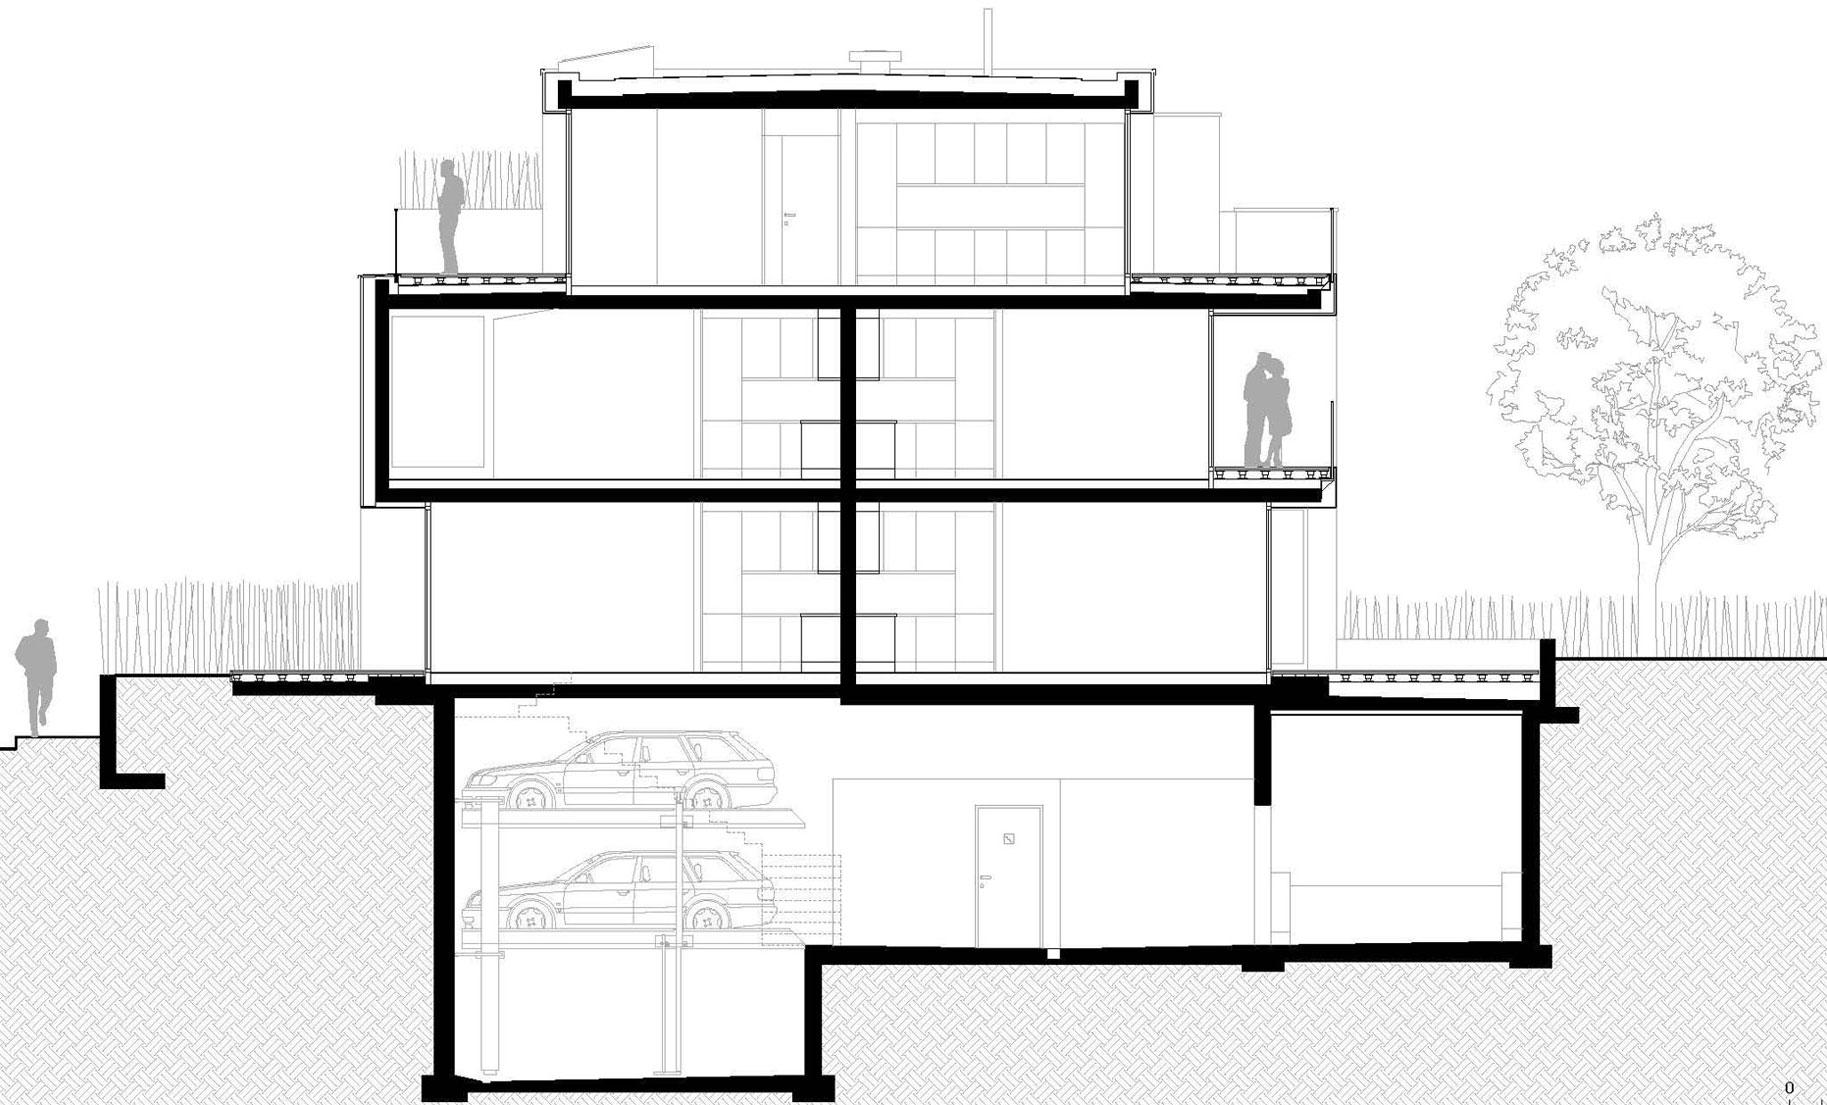 Housing-Building-15